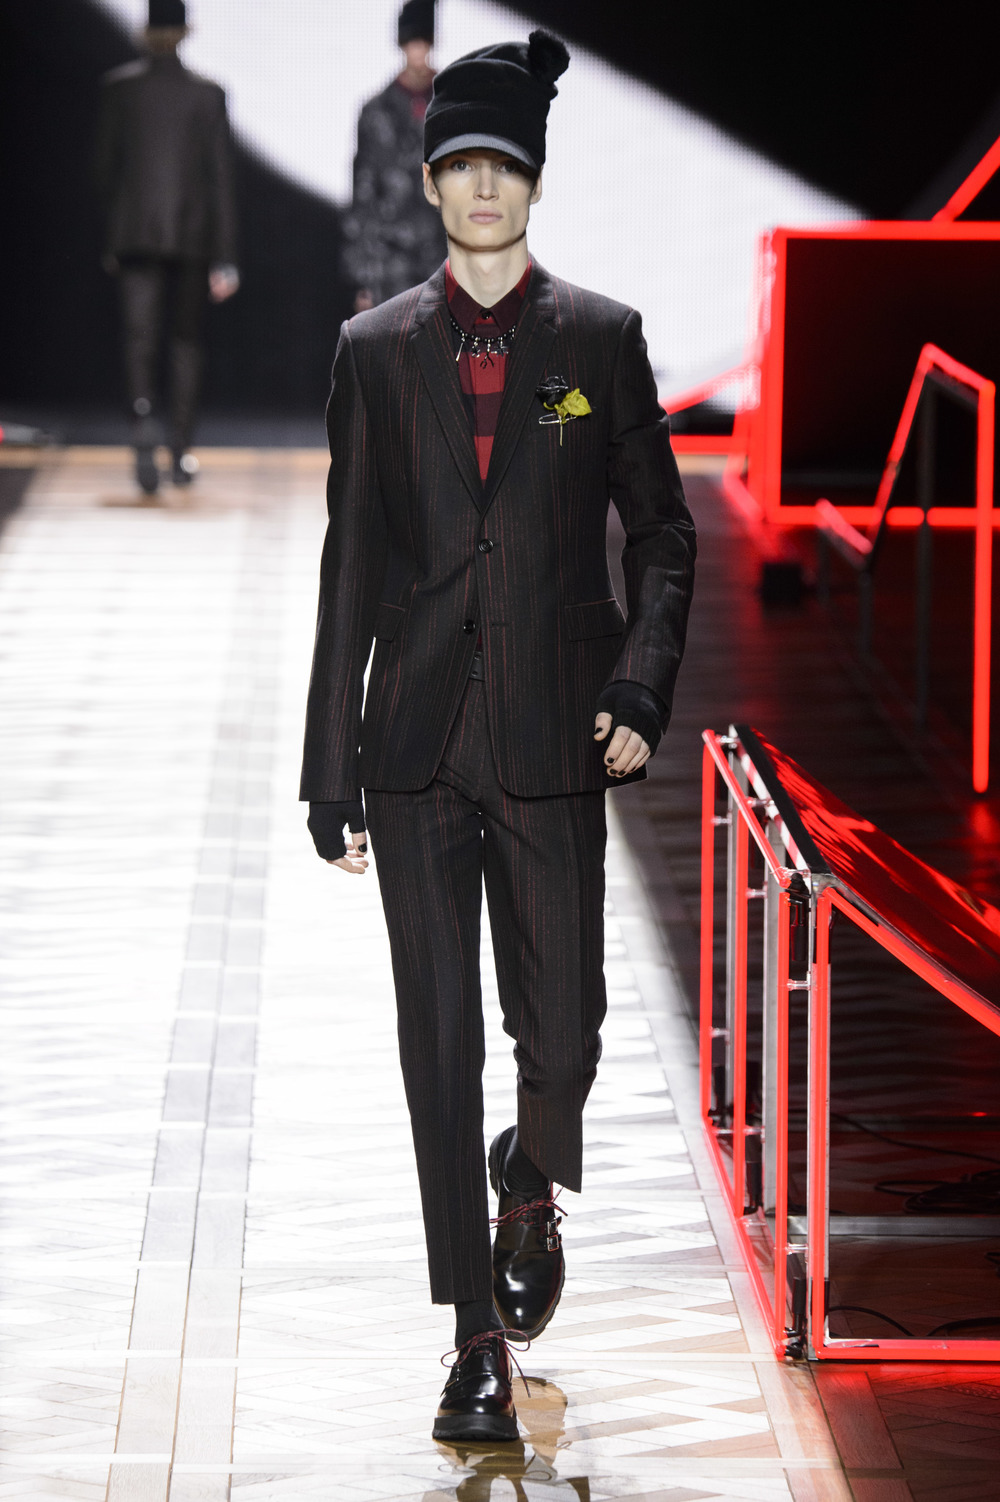 Dior_Homme_Hiver2016-17_look_40.JPG